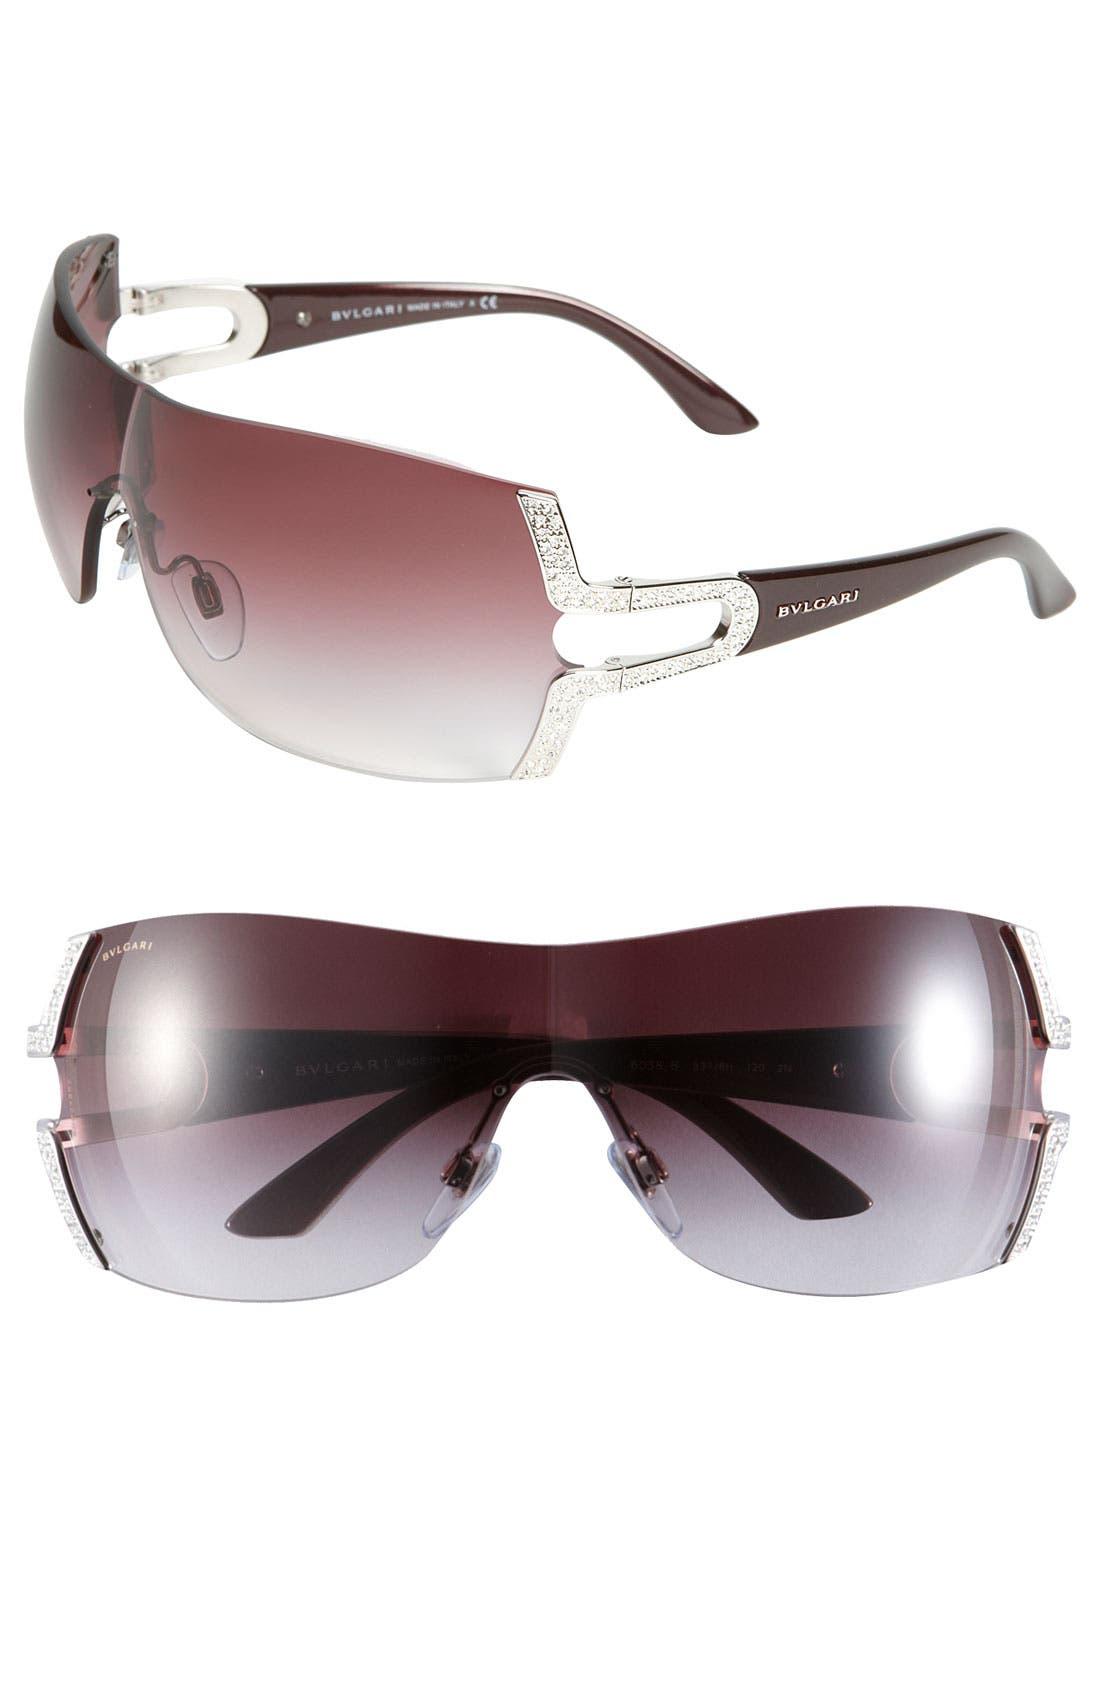 Main Image - BVLGARI Parentesi Motif Shield Sunglasses